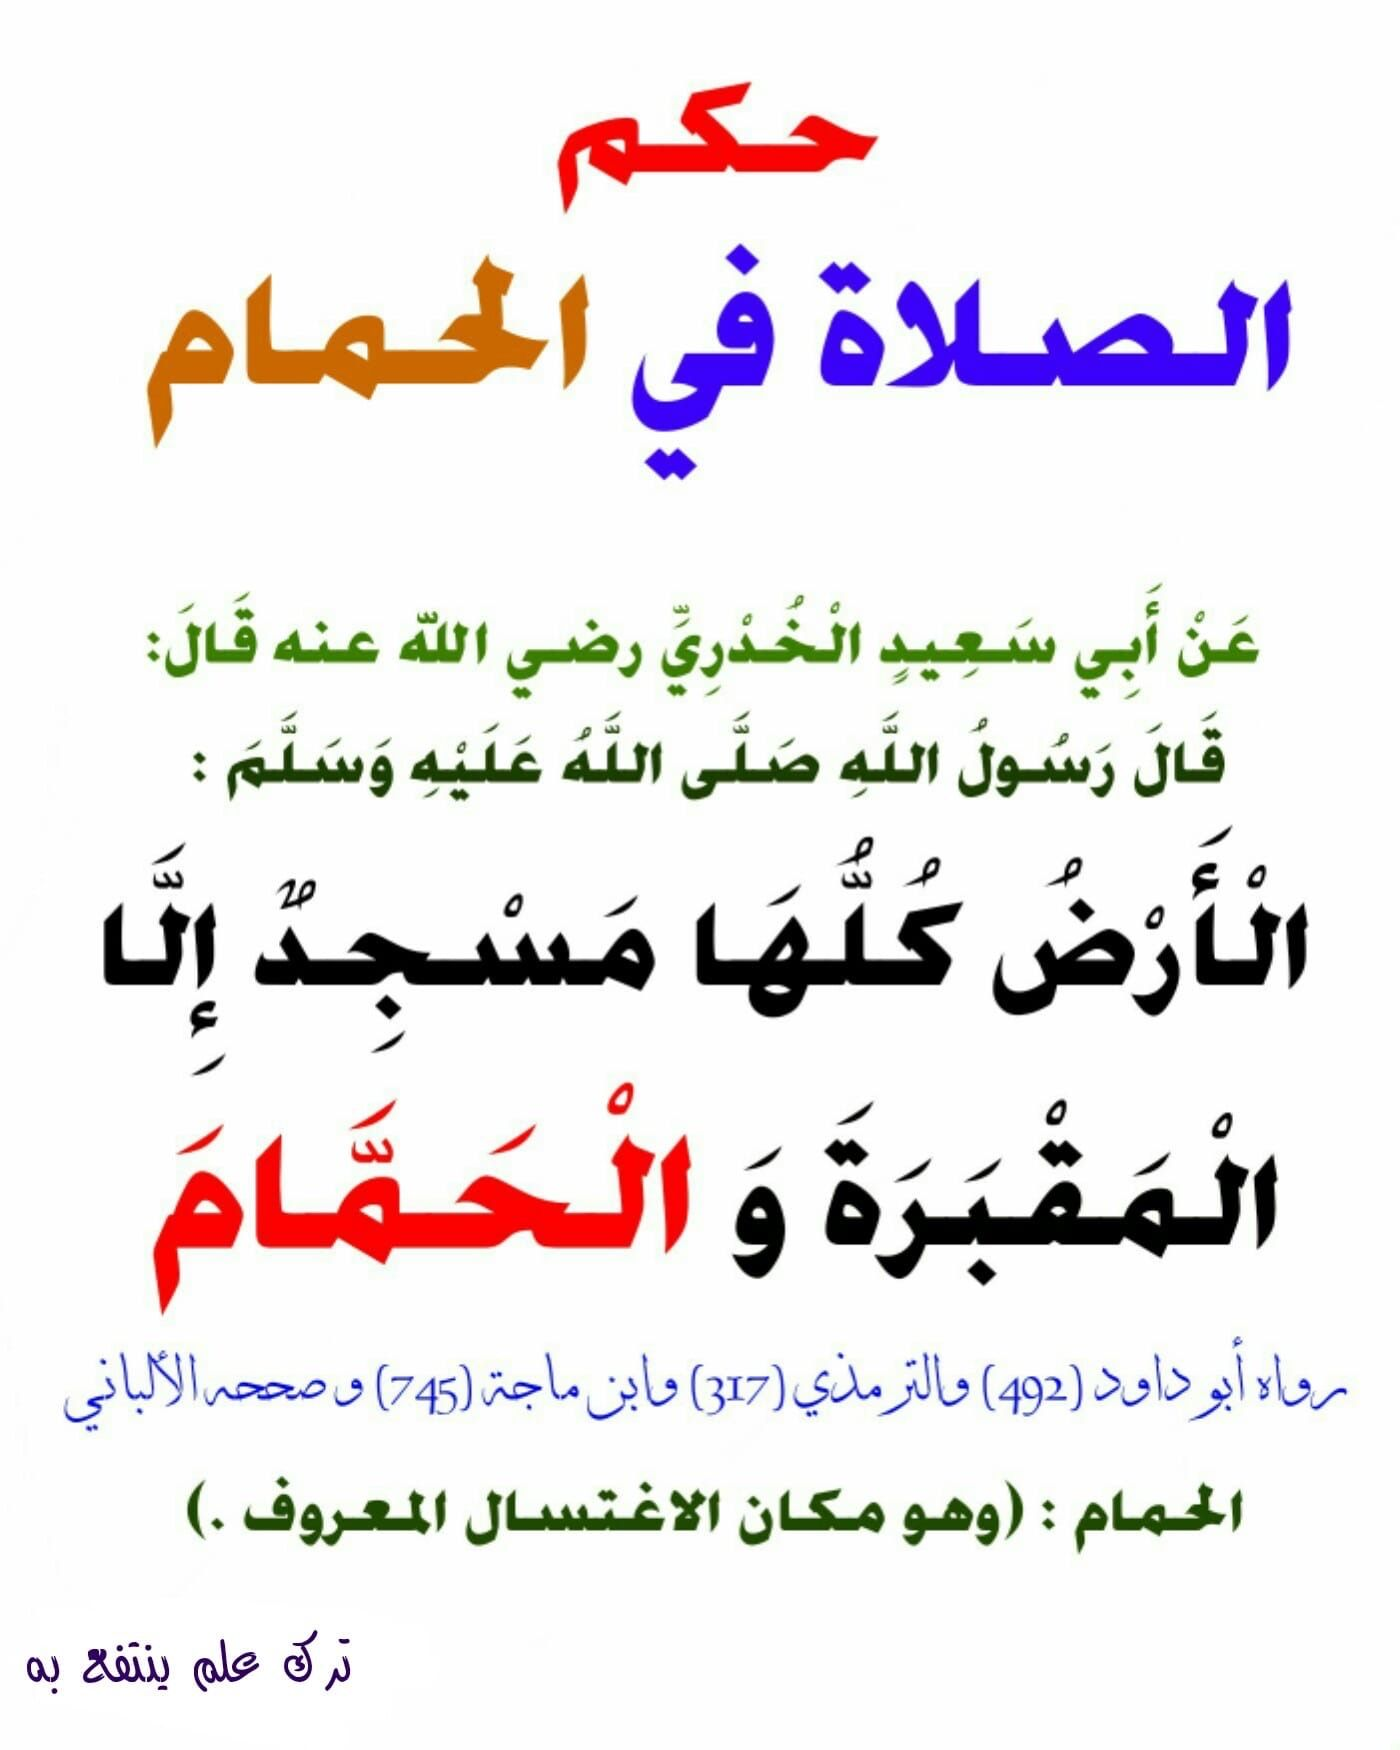 Pin By رياض بوخروبة أبو خديجة On Divers Bd منوعات فقهية Islamic Phrases Quran Verses Islam Facts